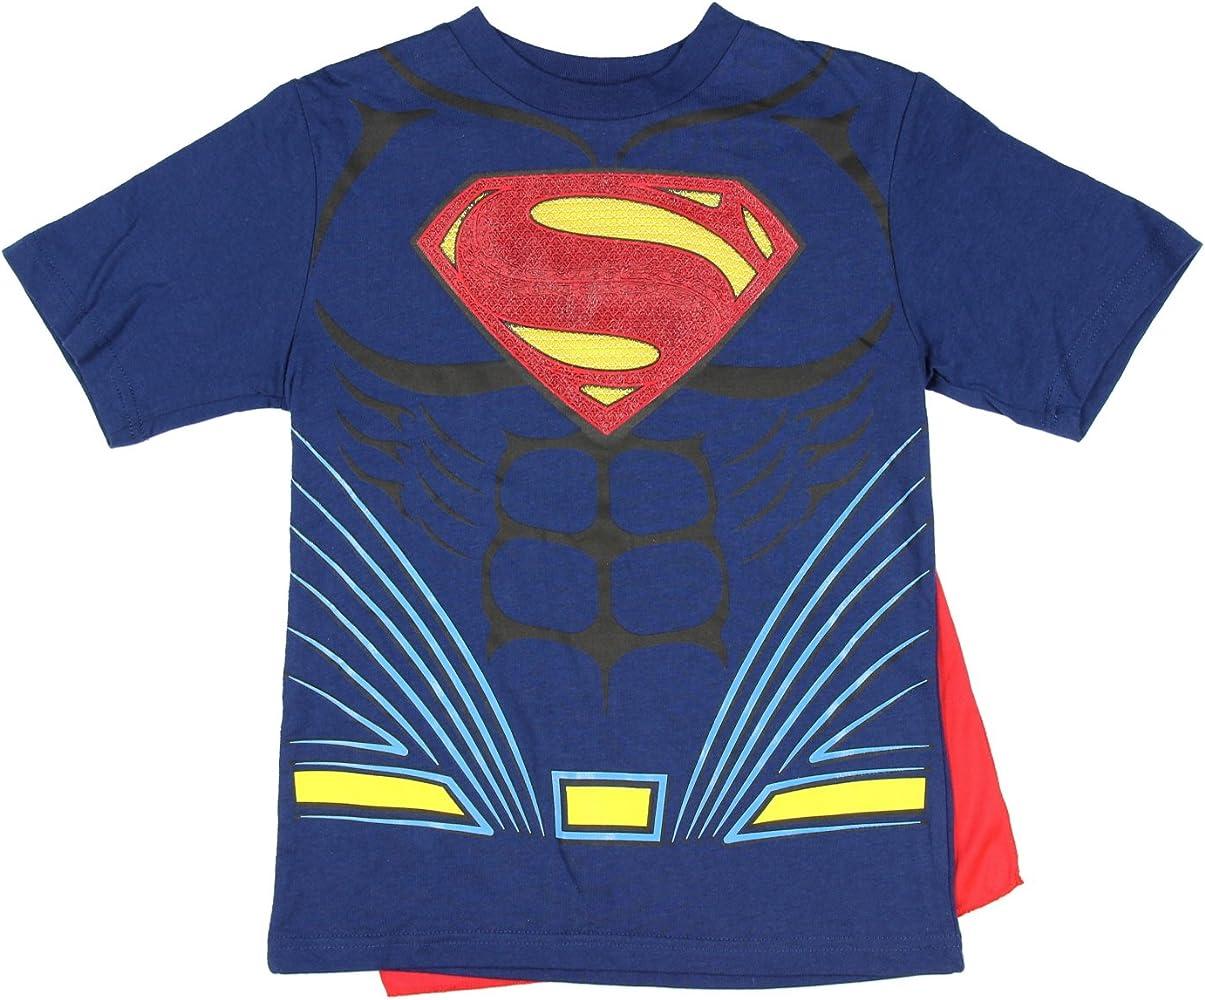 Amazon Com Dc Comics Superman Costume With Cape Boys Graphic T Shirt Xxl 18 Clothing